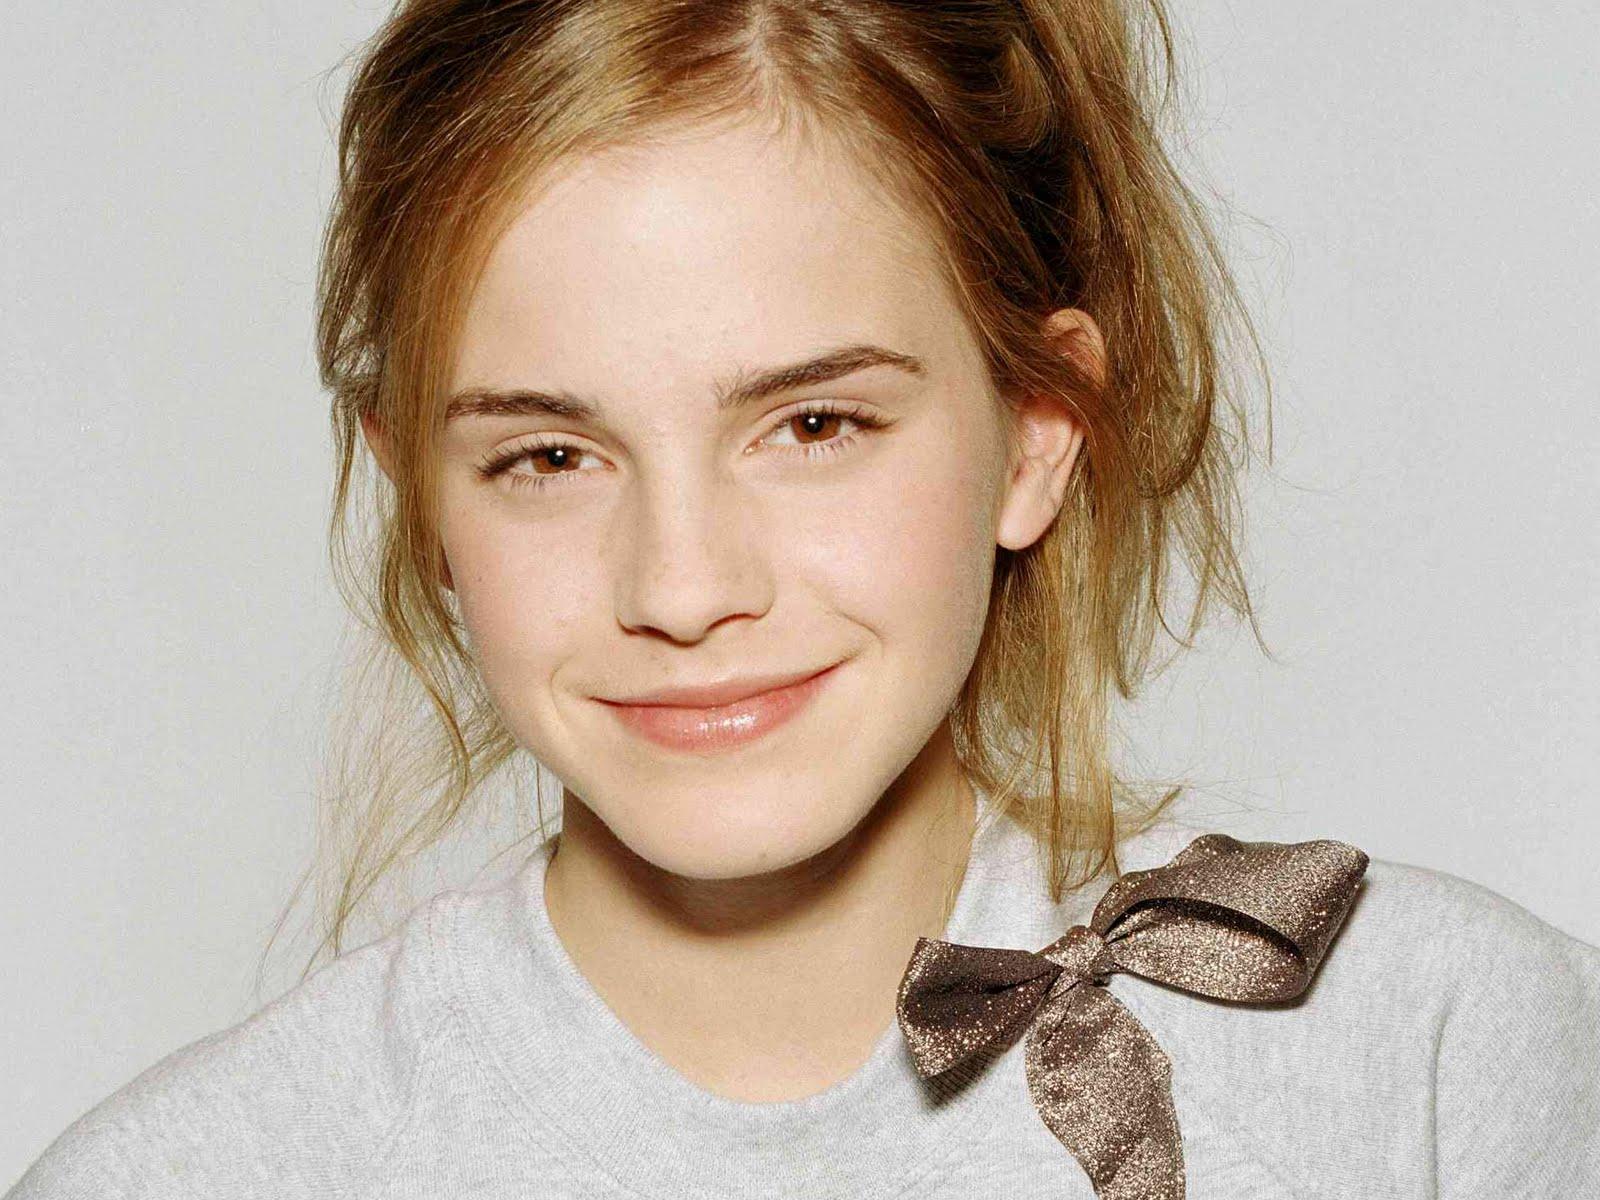 Emma Watson Hair Style: Hairstyle Photo: Emma Watson's Top 5 Enchanting Hairstyles